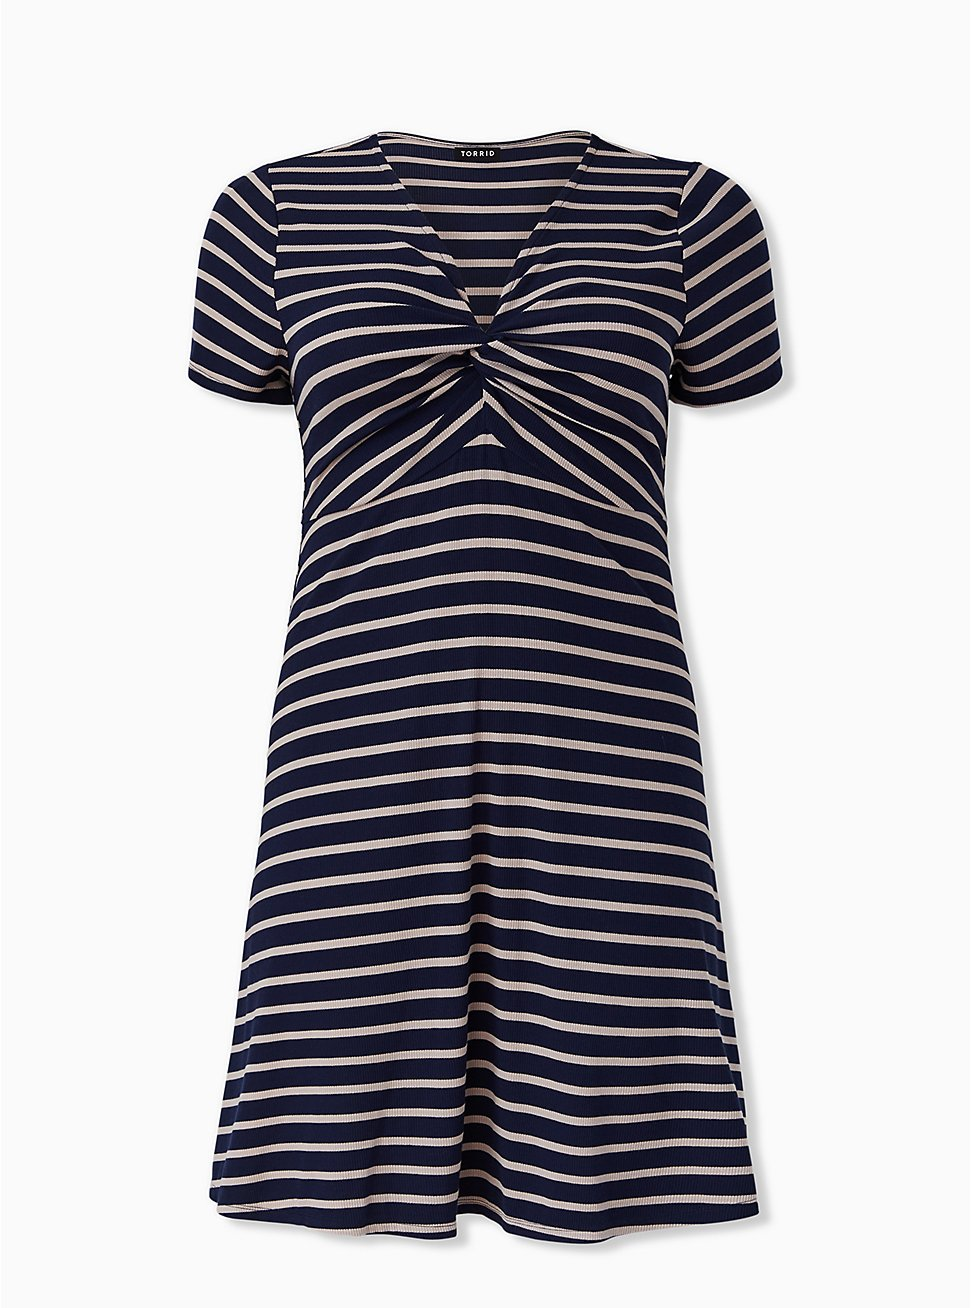 Navy & Taupe Stripe Rib Twist Front Dress, STRIPE-NAVY, hi-res